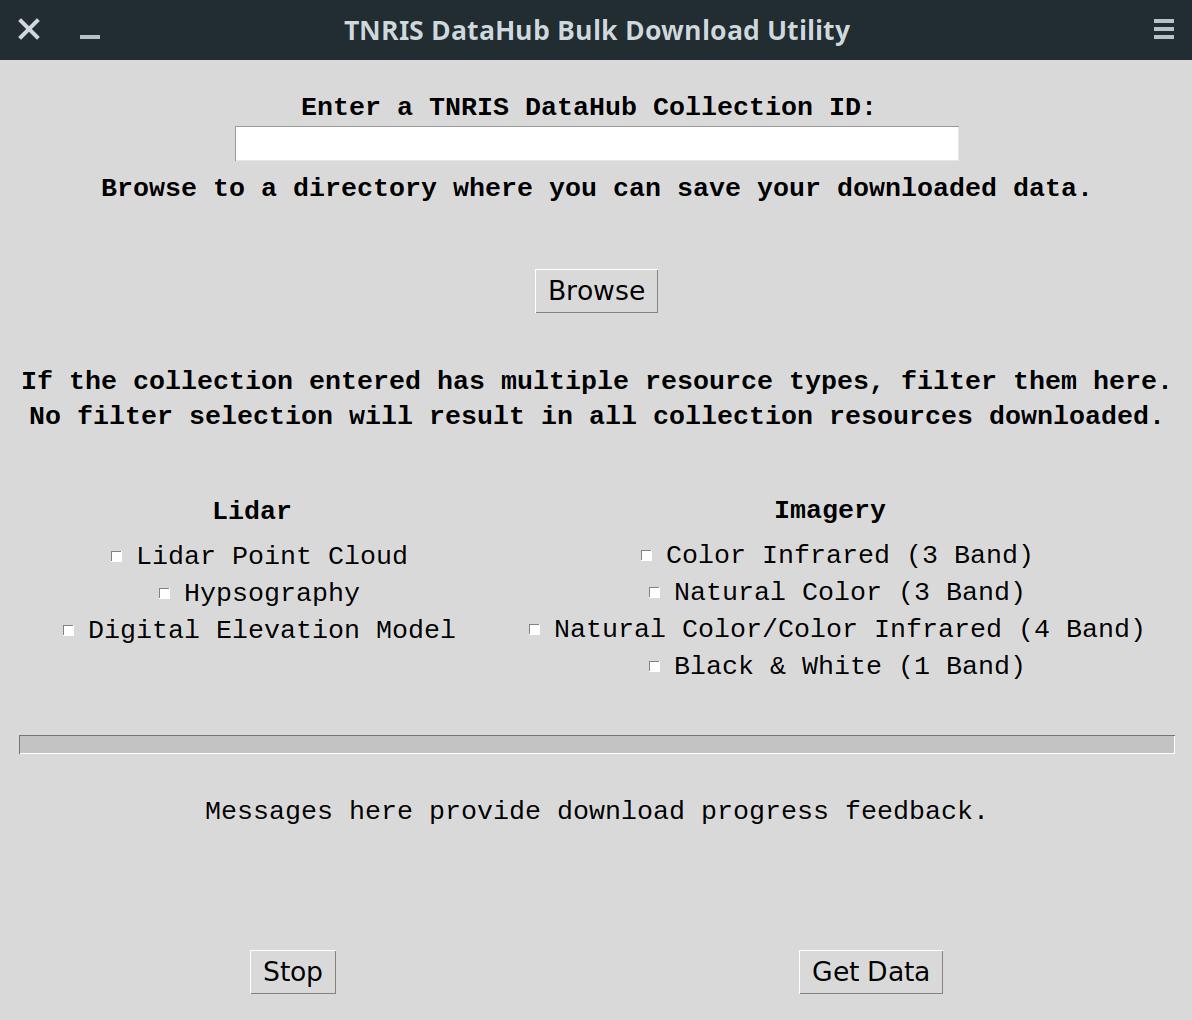 TNRIS Bulk Downloader